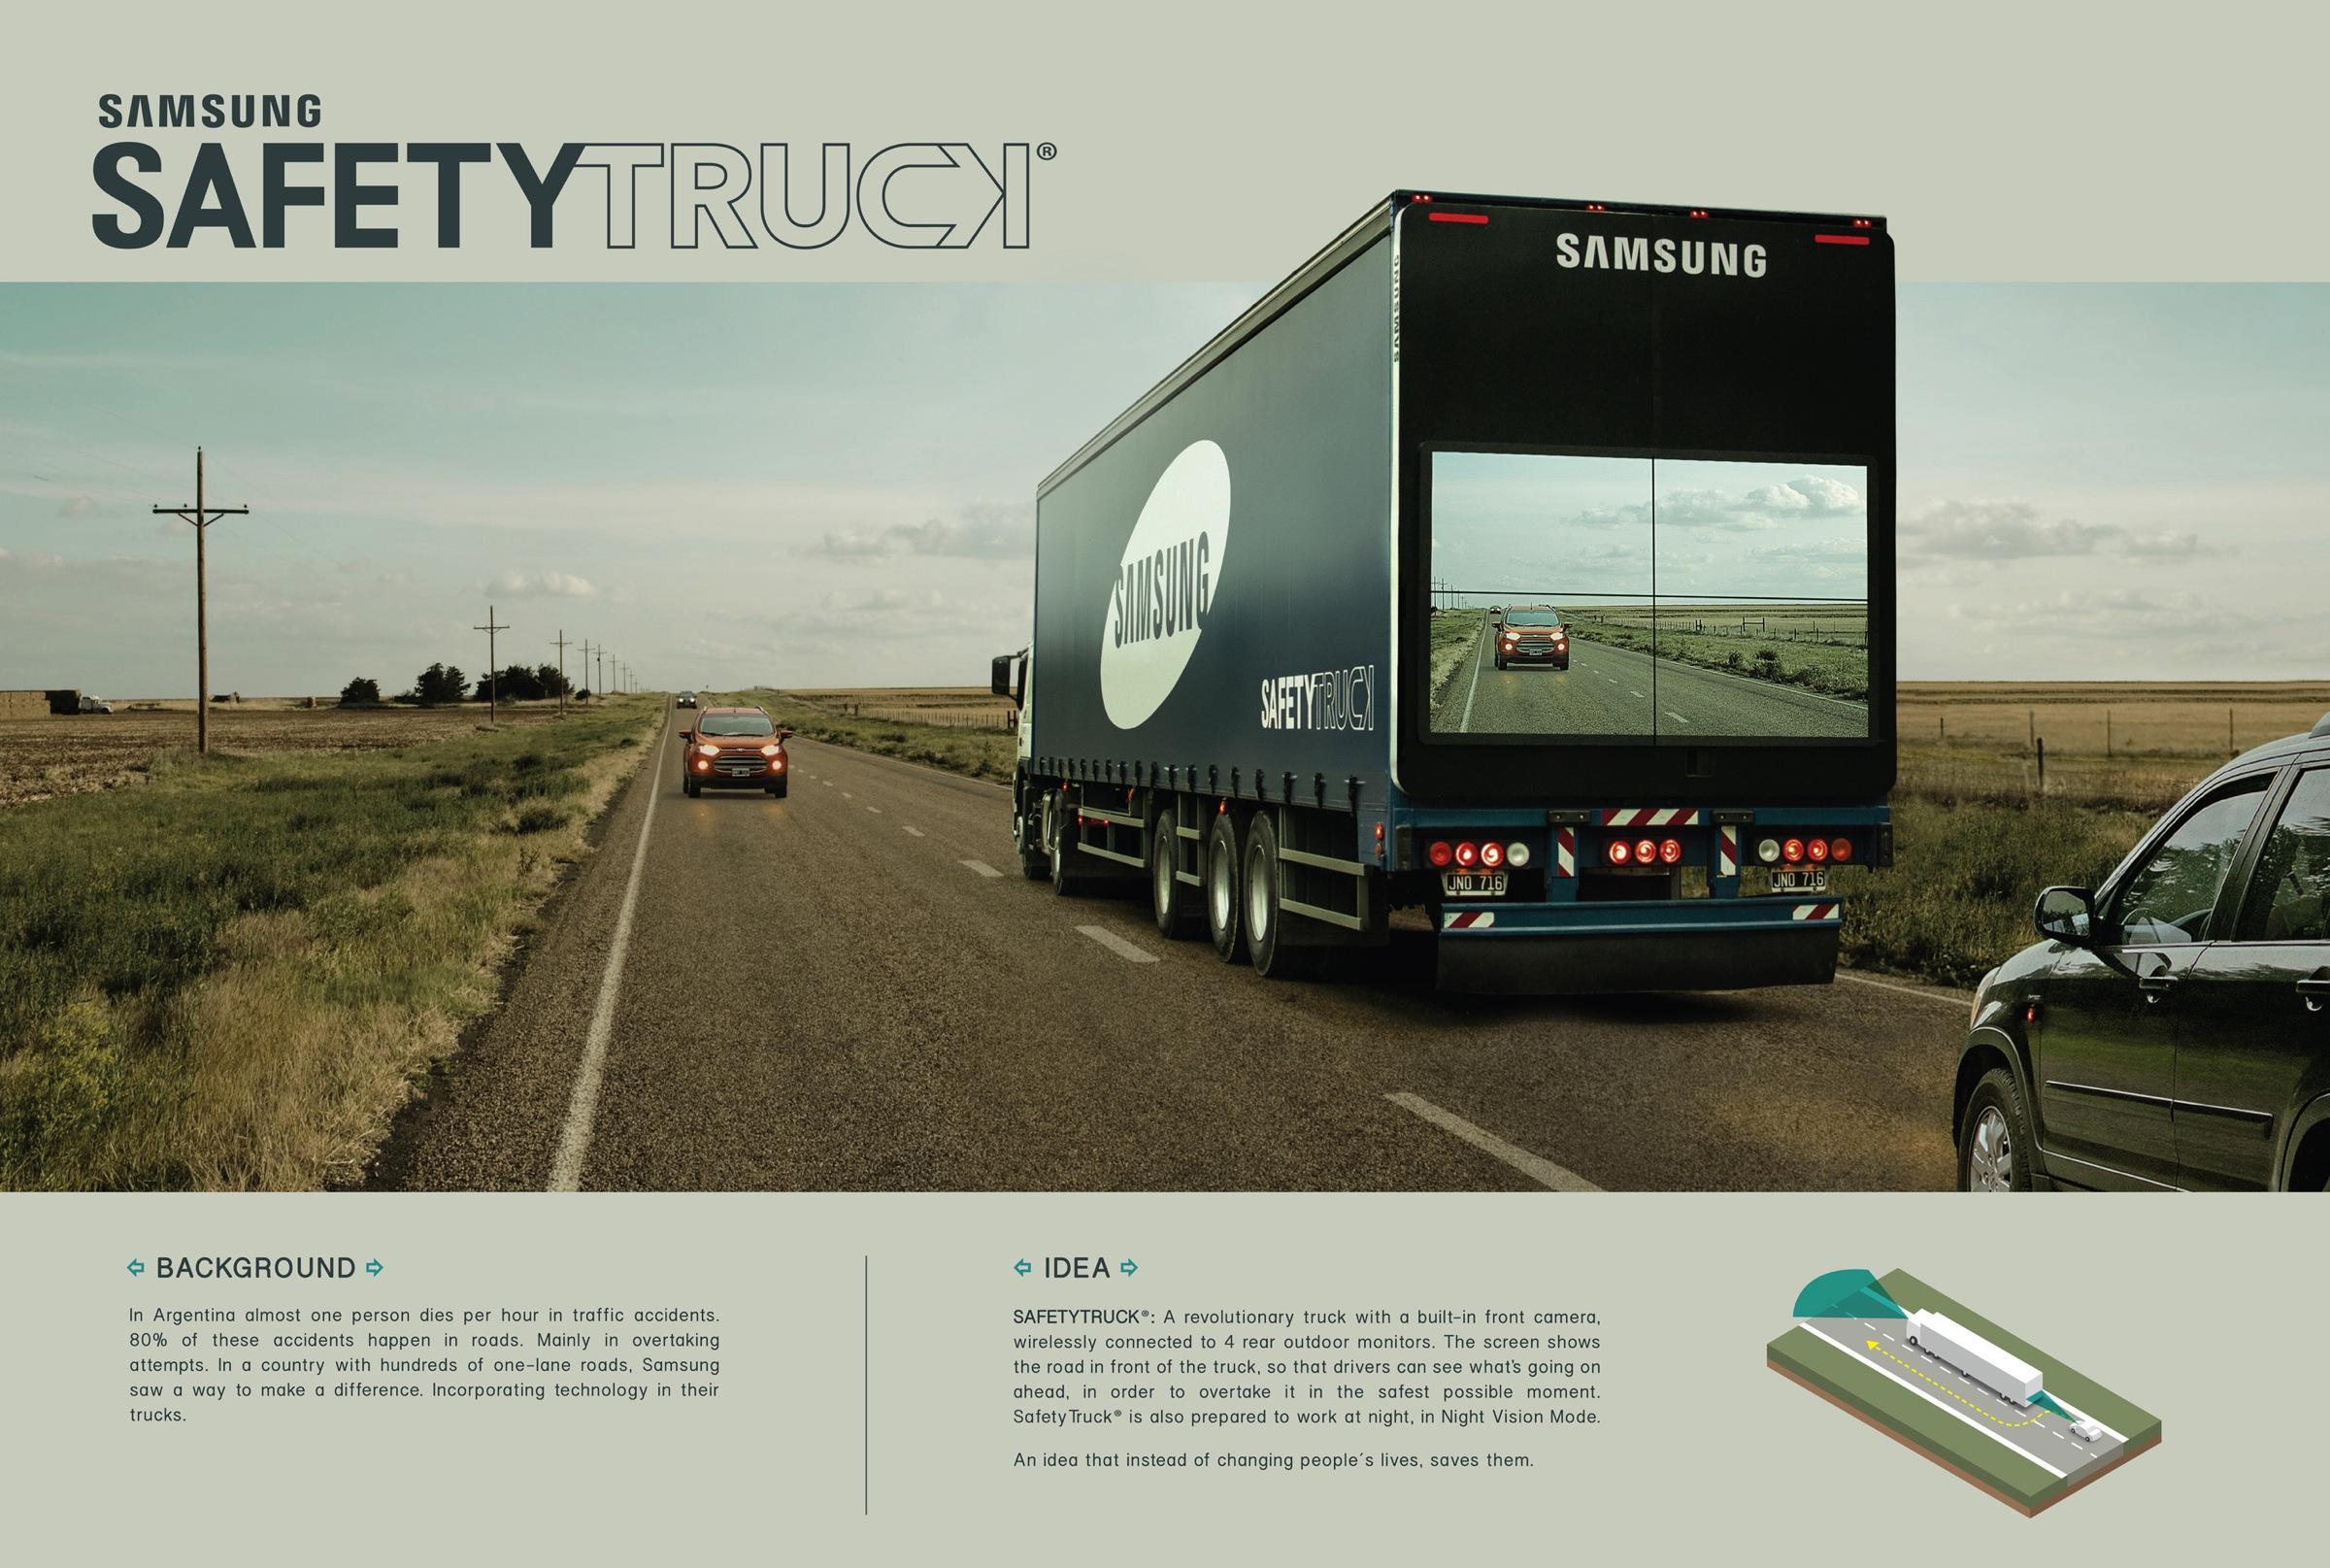 samsung-safety-truck-print-outdoor-leo-burnett-argentina-camera-back-best-print-ads-2015-gunn-report-1